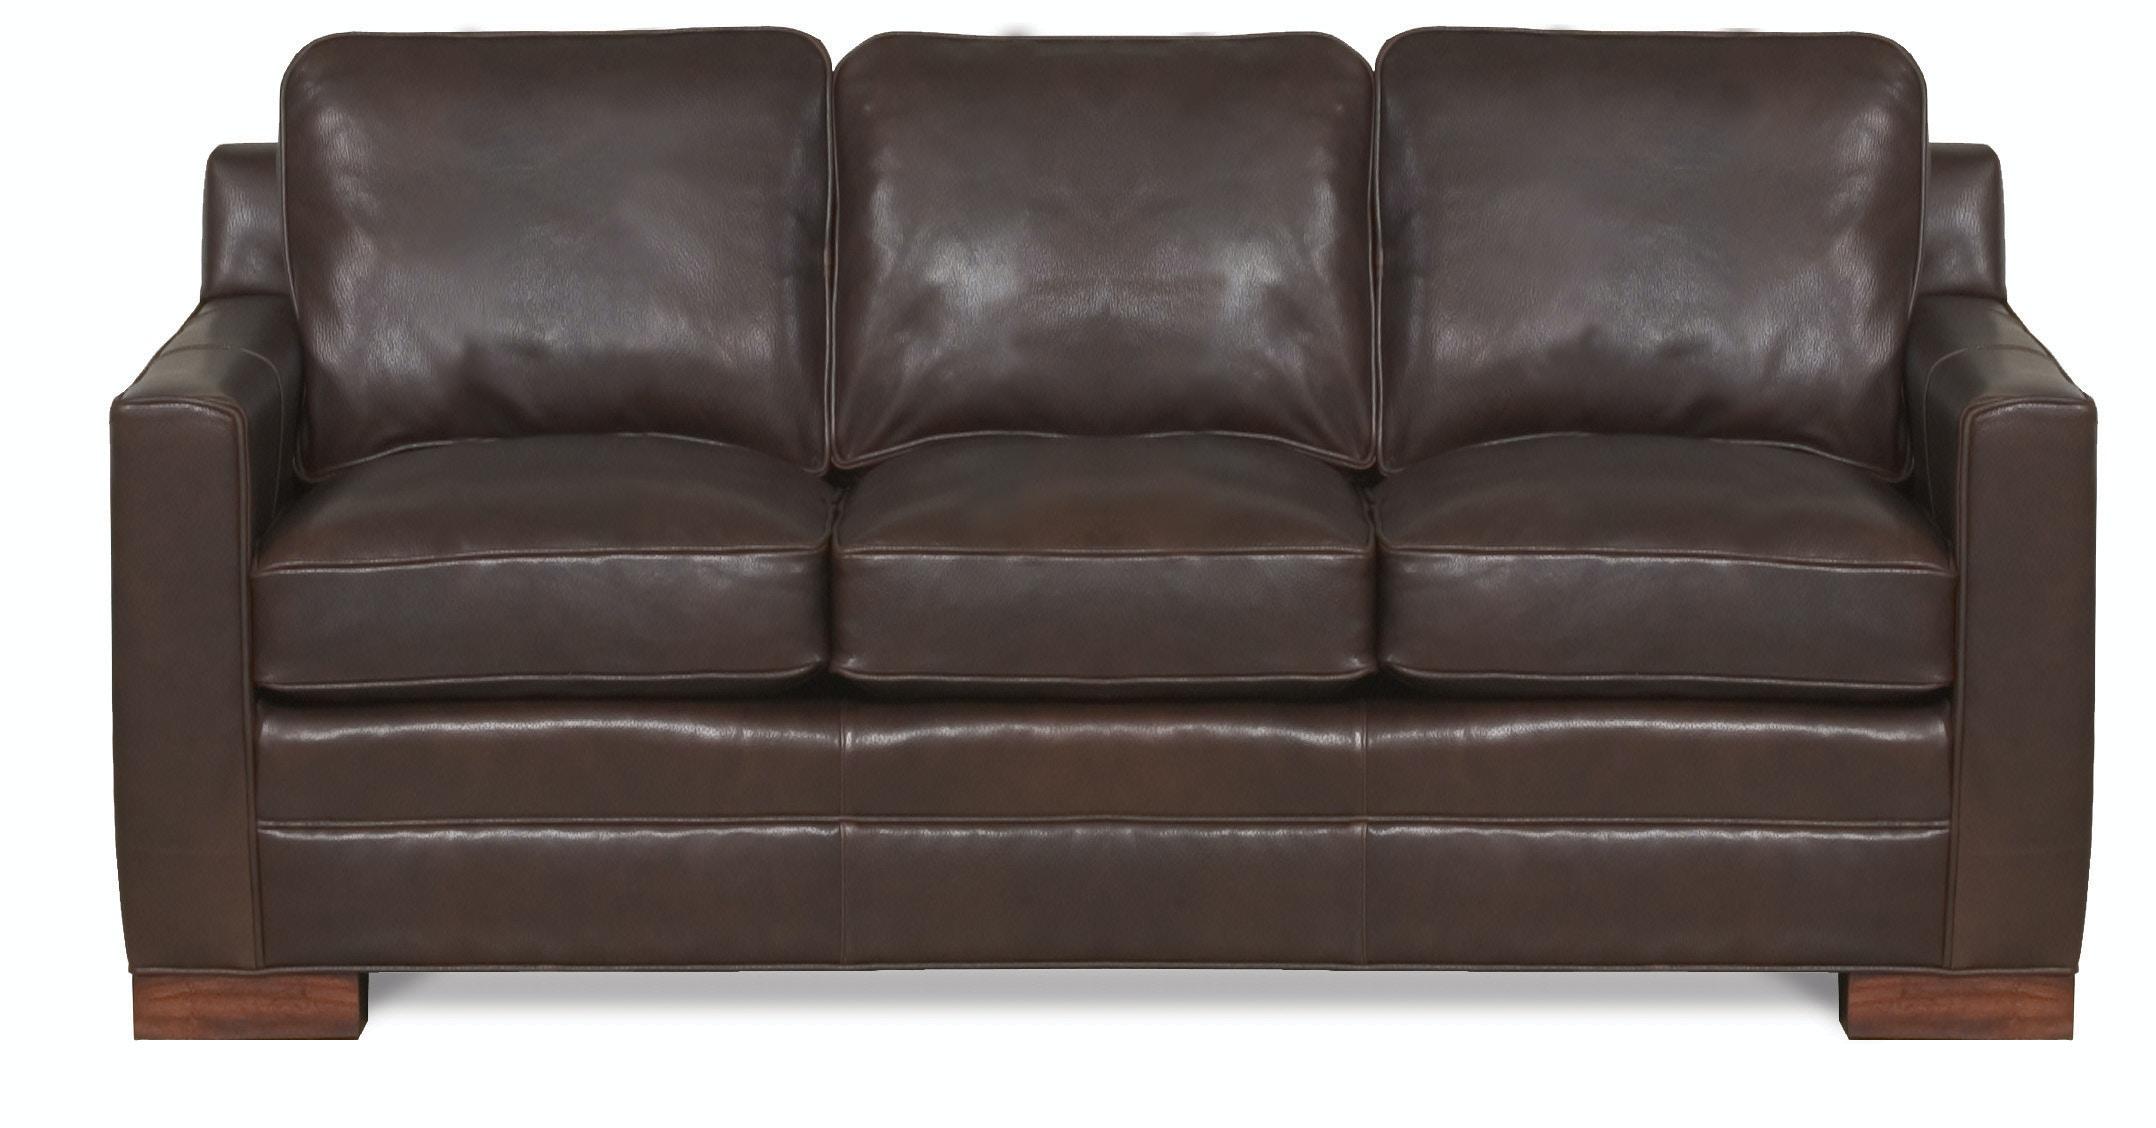 Vanguard Furniture American Bungalow Summerton Sofa 610 S